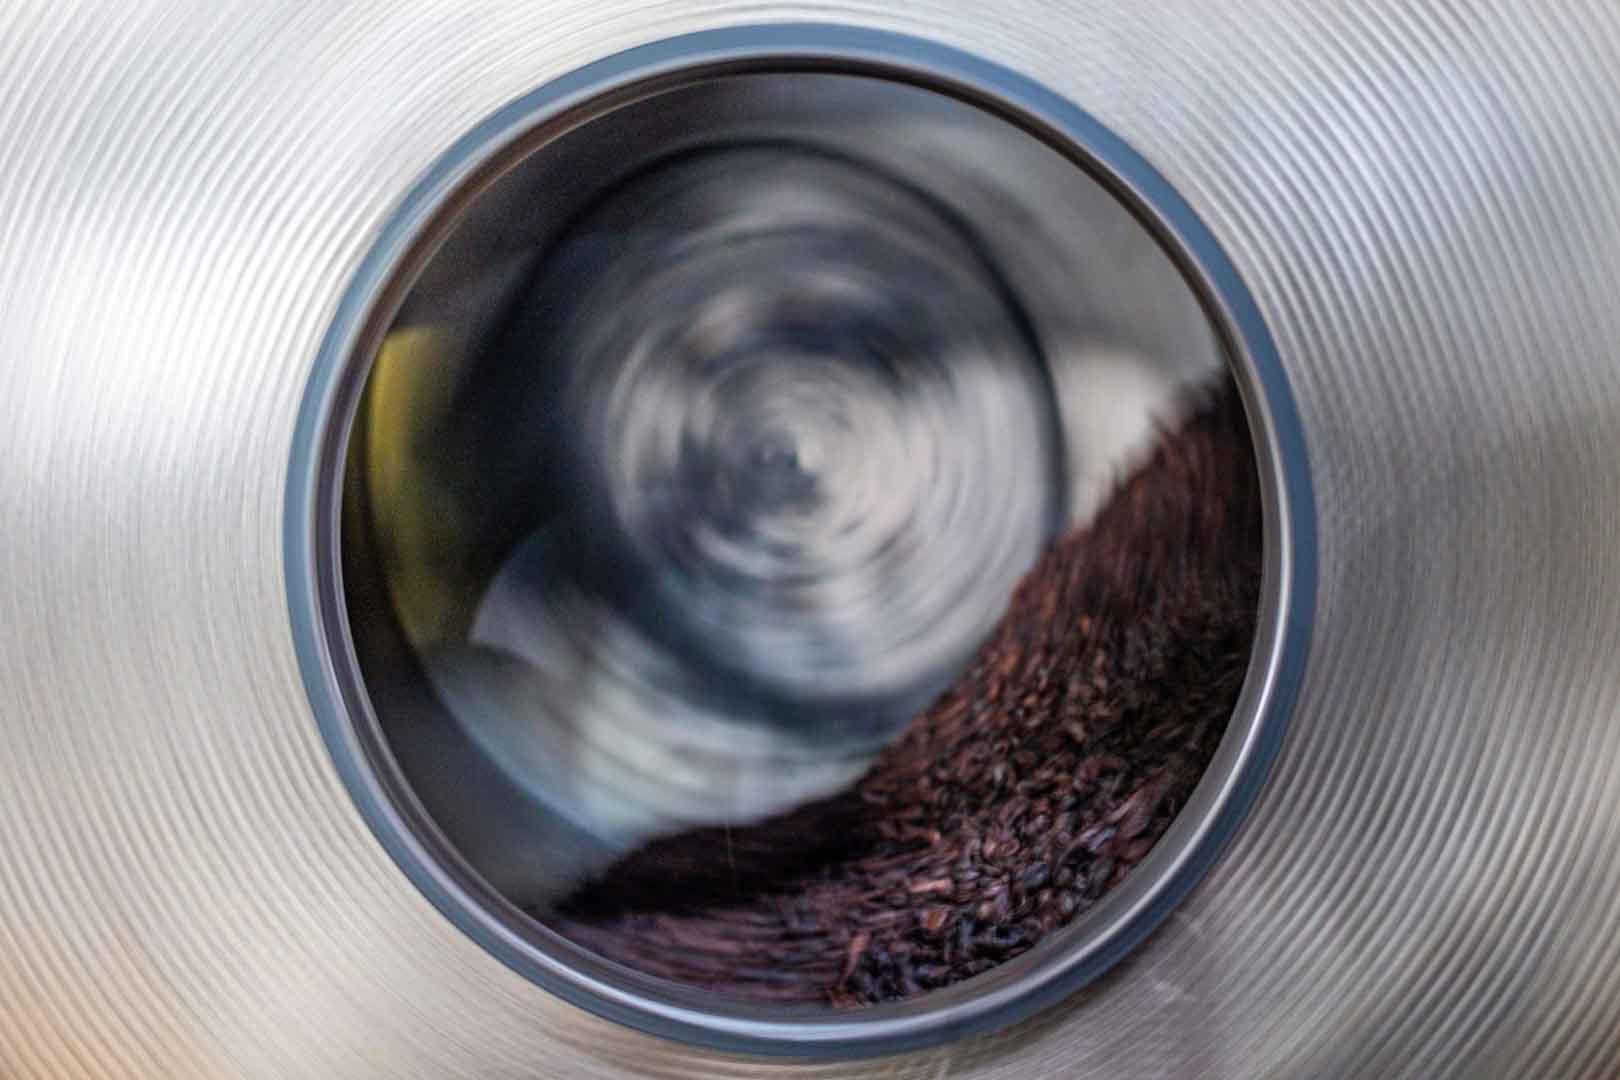 جدا کردن پوسته دانه قهوه